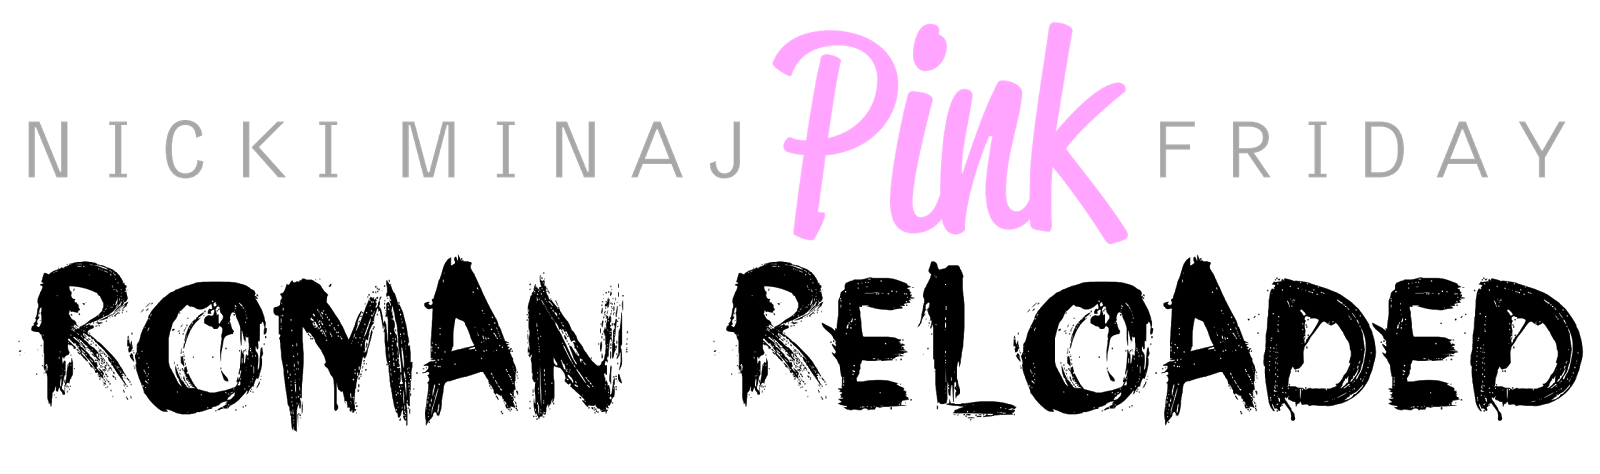 lilbadboy0 logo nicki minaj pink friday roman reloaded